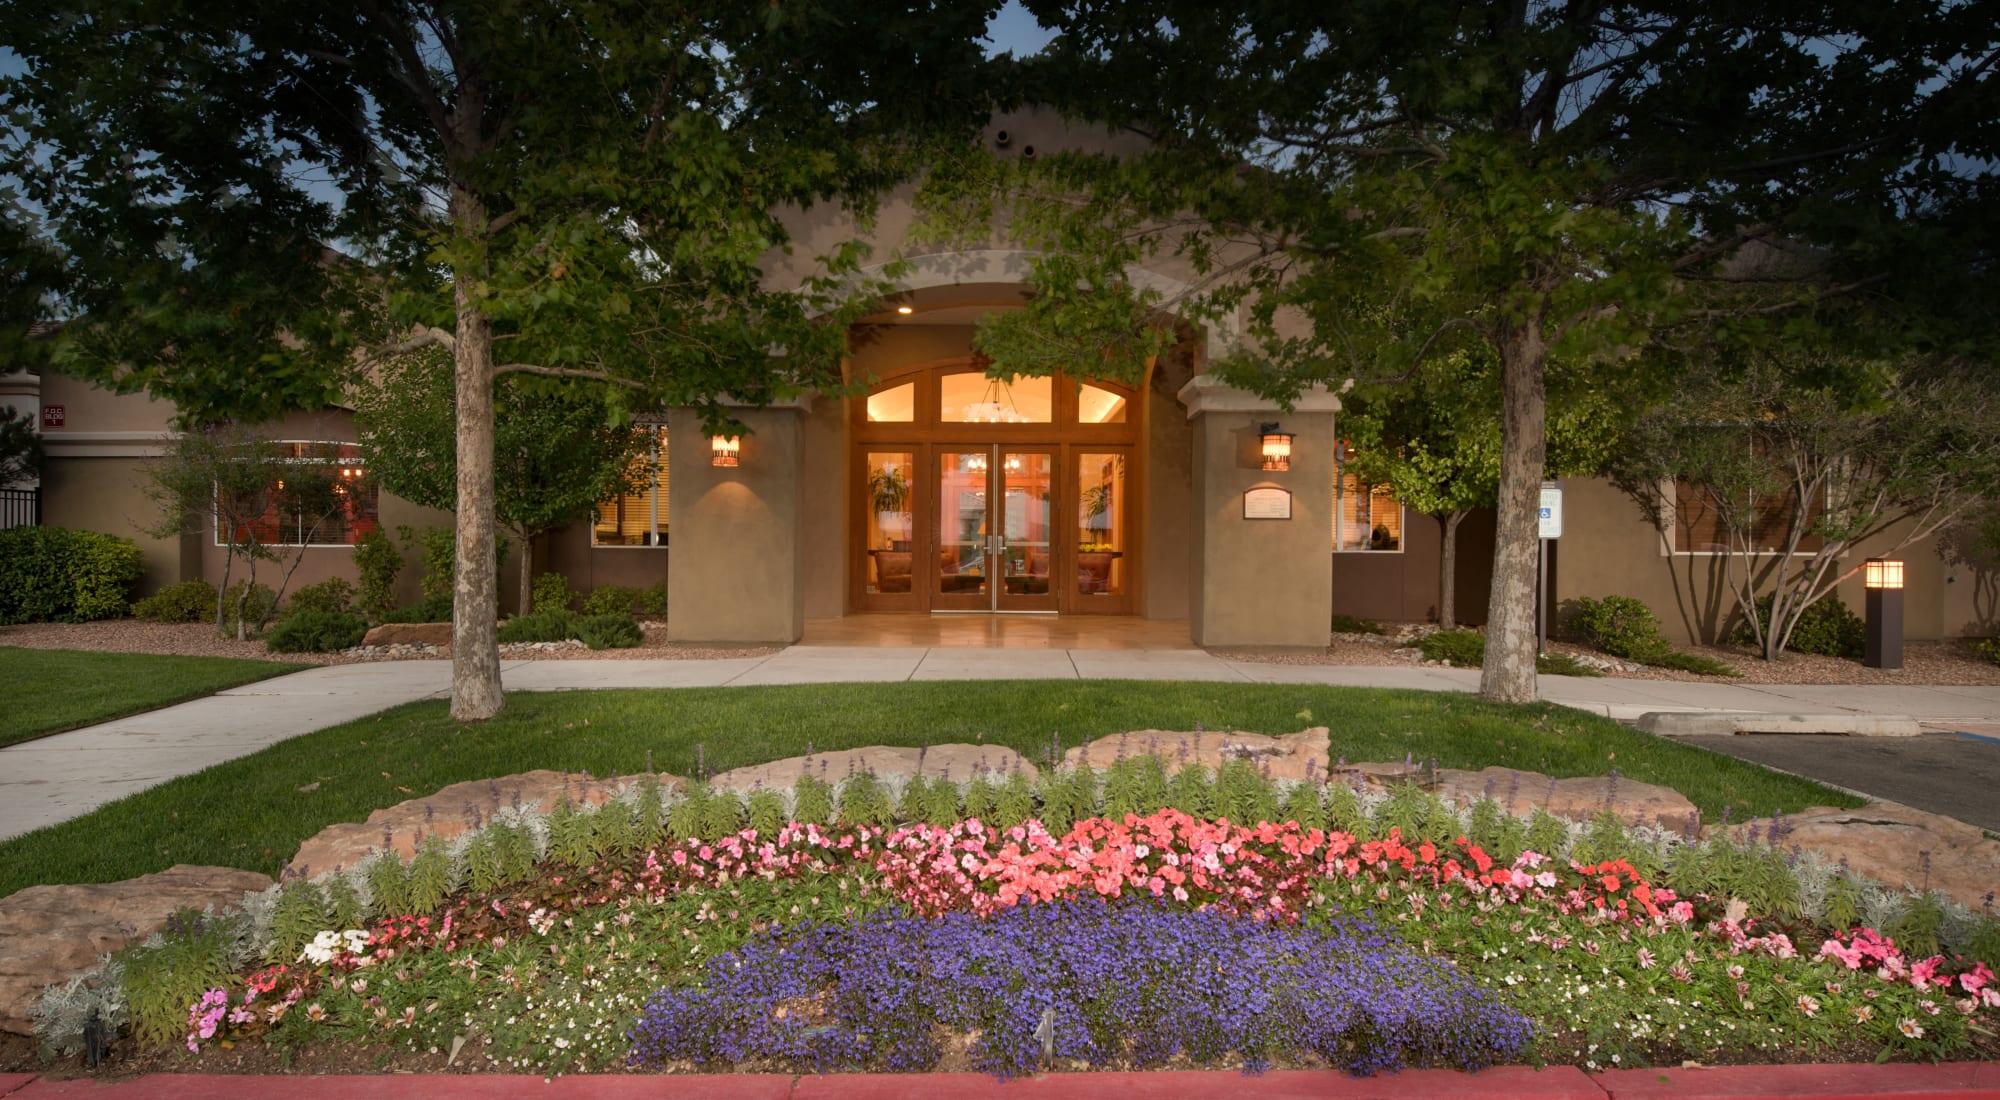 Private policy at Broadstone Towne Center in Albuquerque, New Mexico